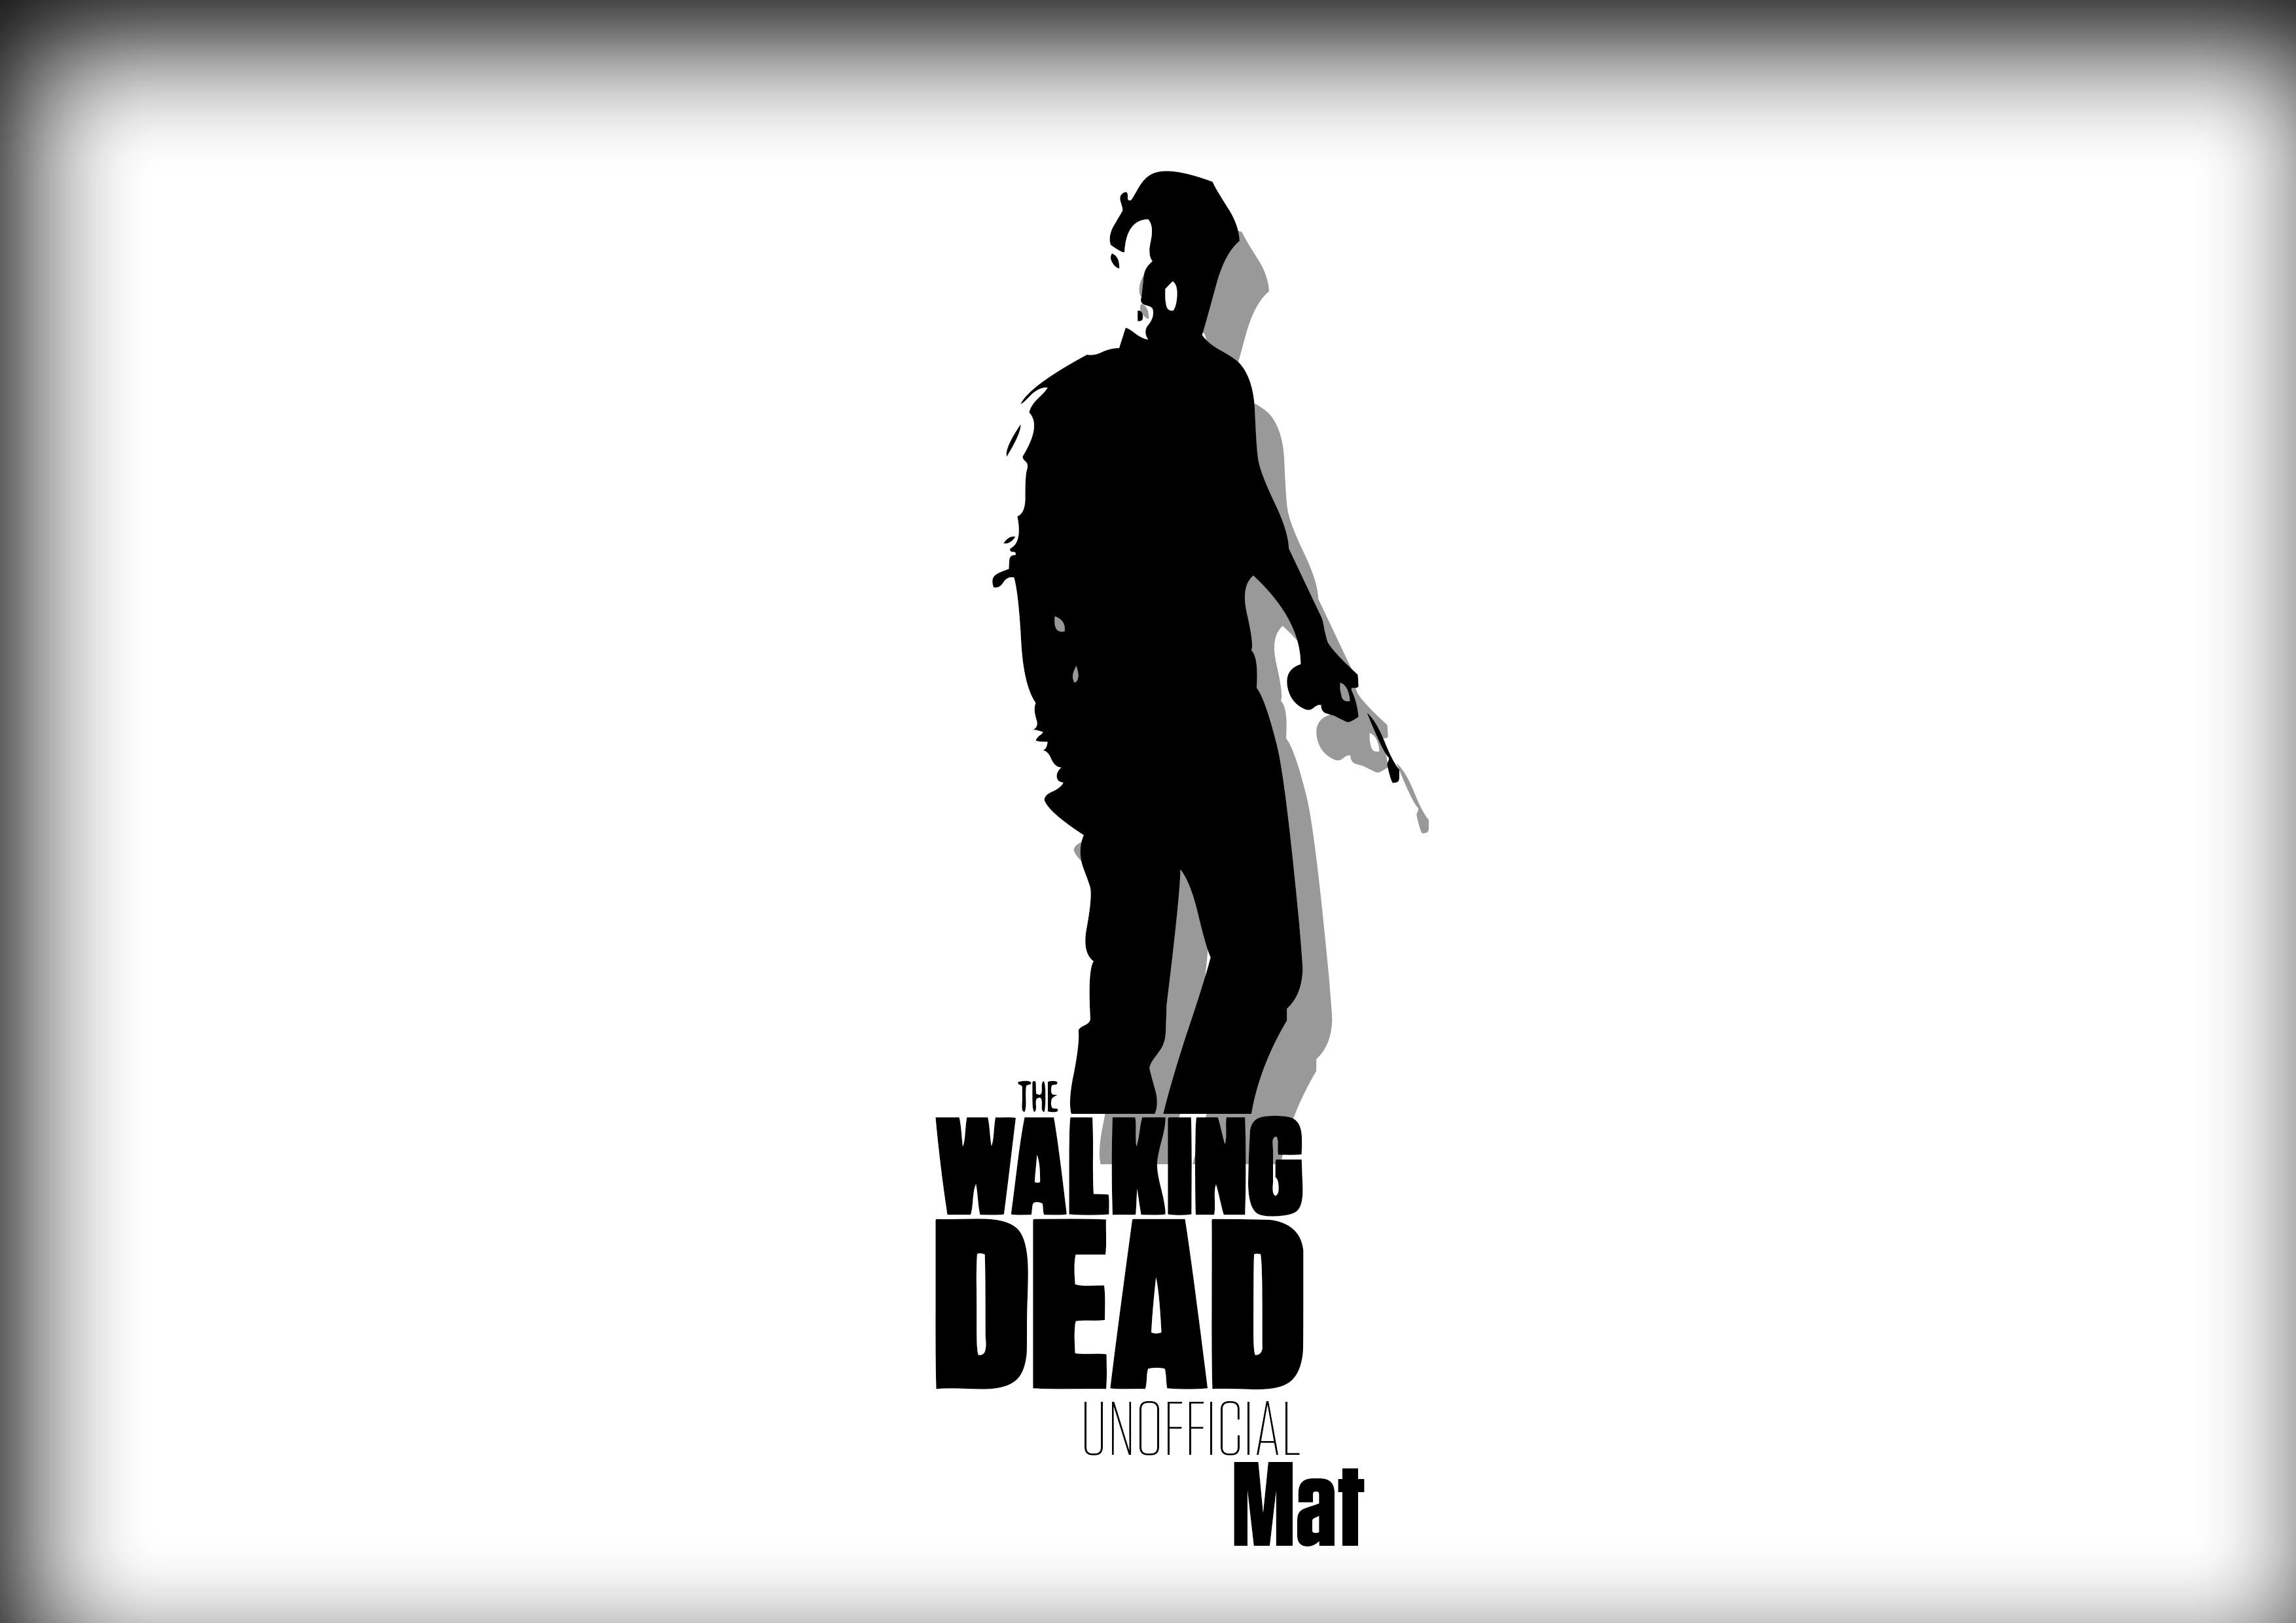 3508x2480 Wallpaper Illustration, Silhouette, Text, The Walking Dead